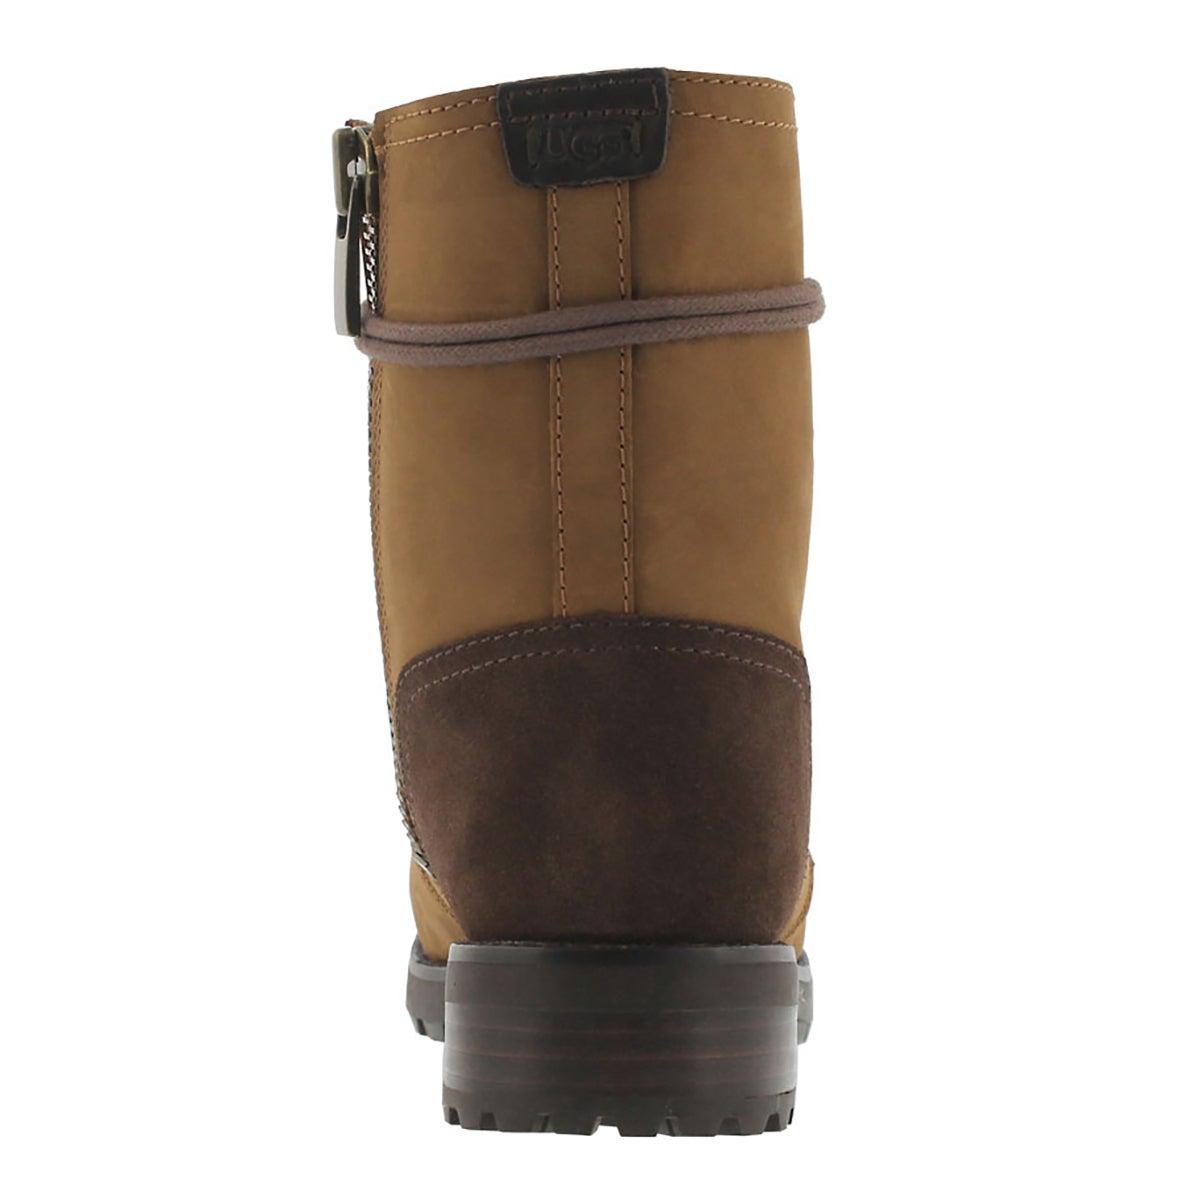 Lds Kilmer chestnut lace up combat boot